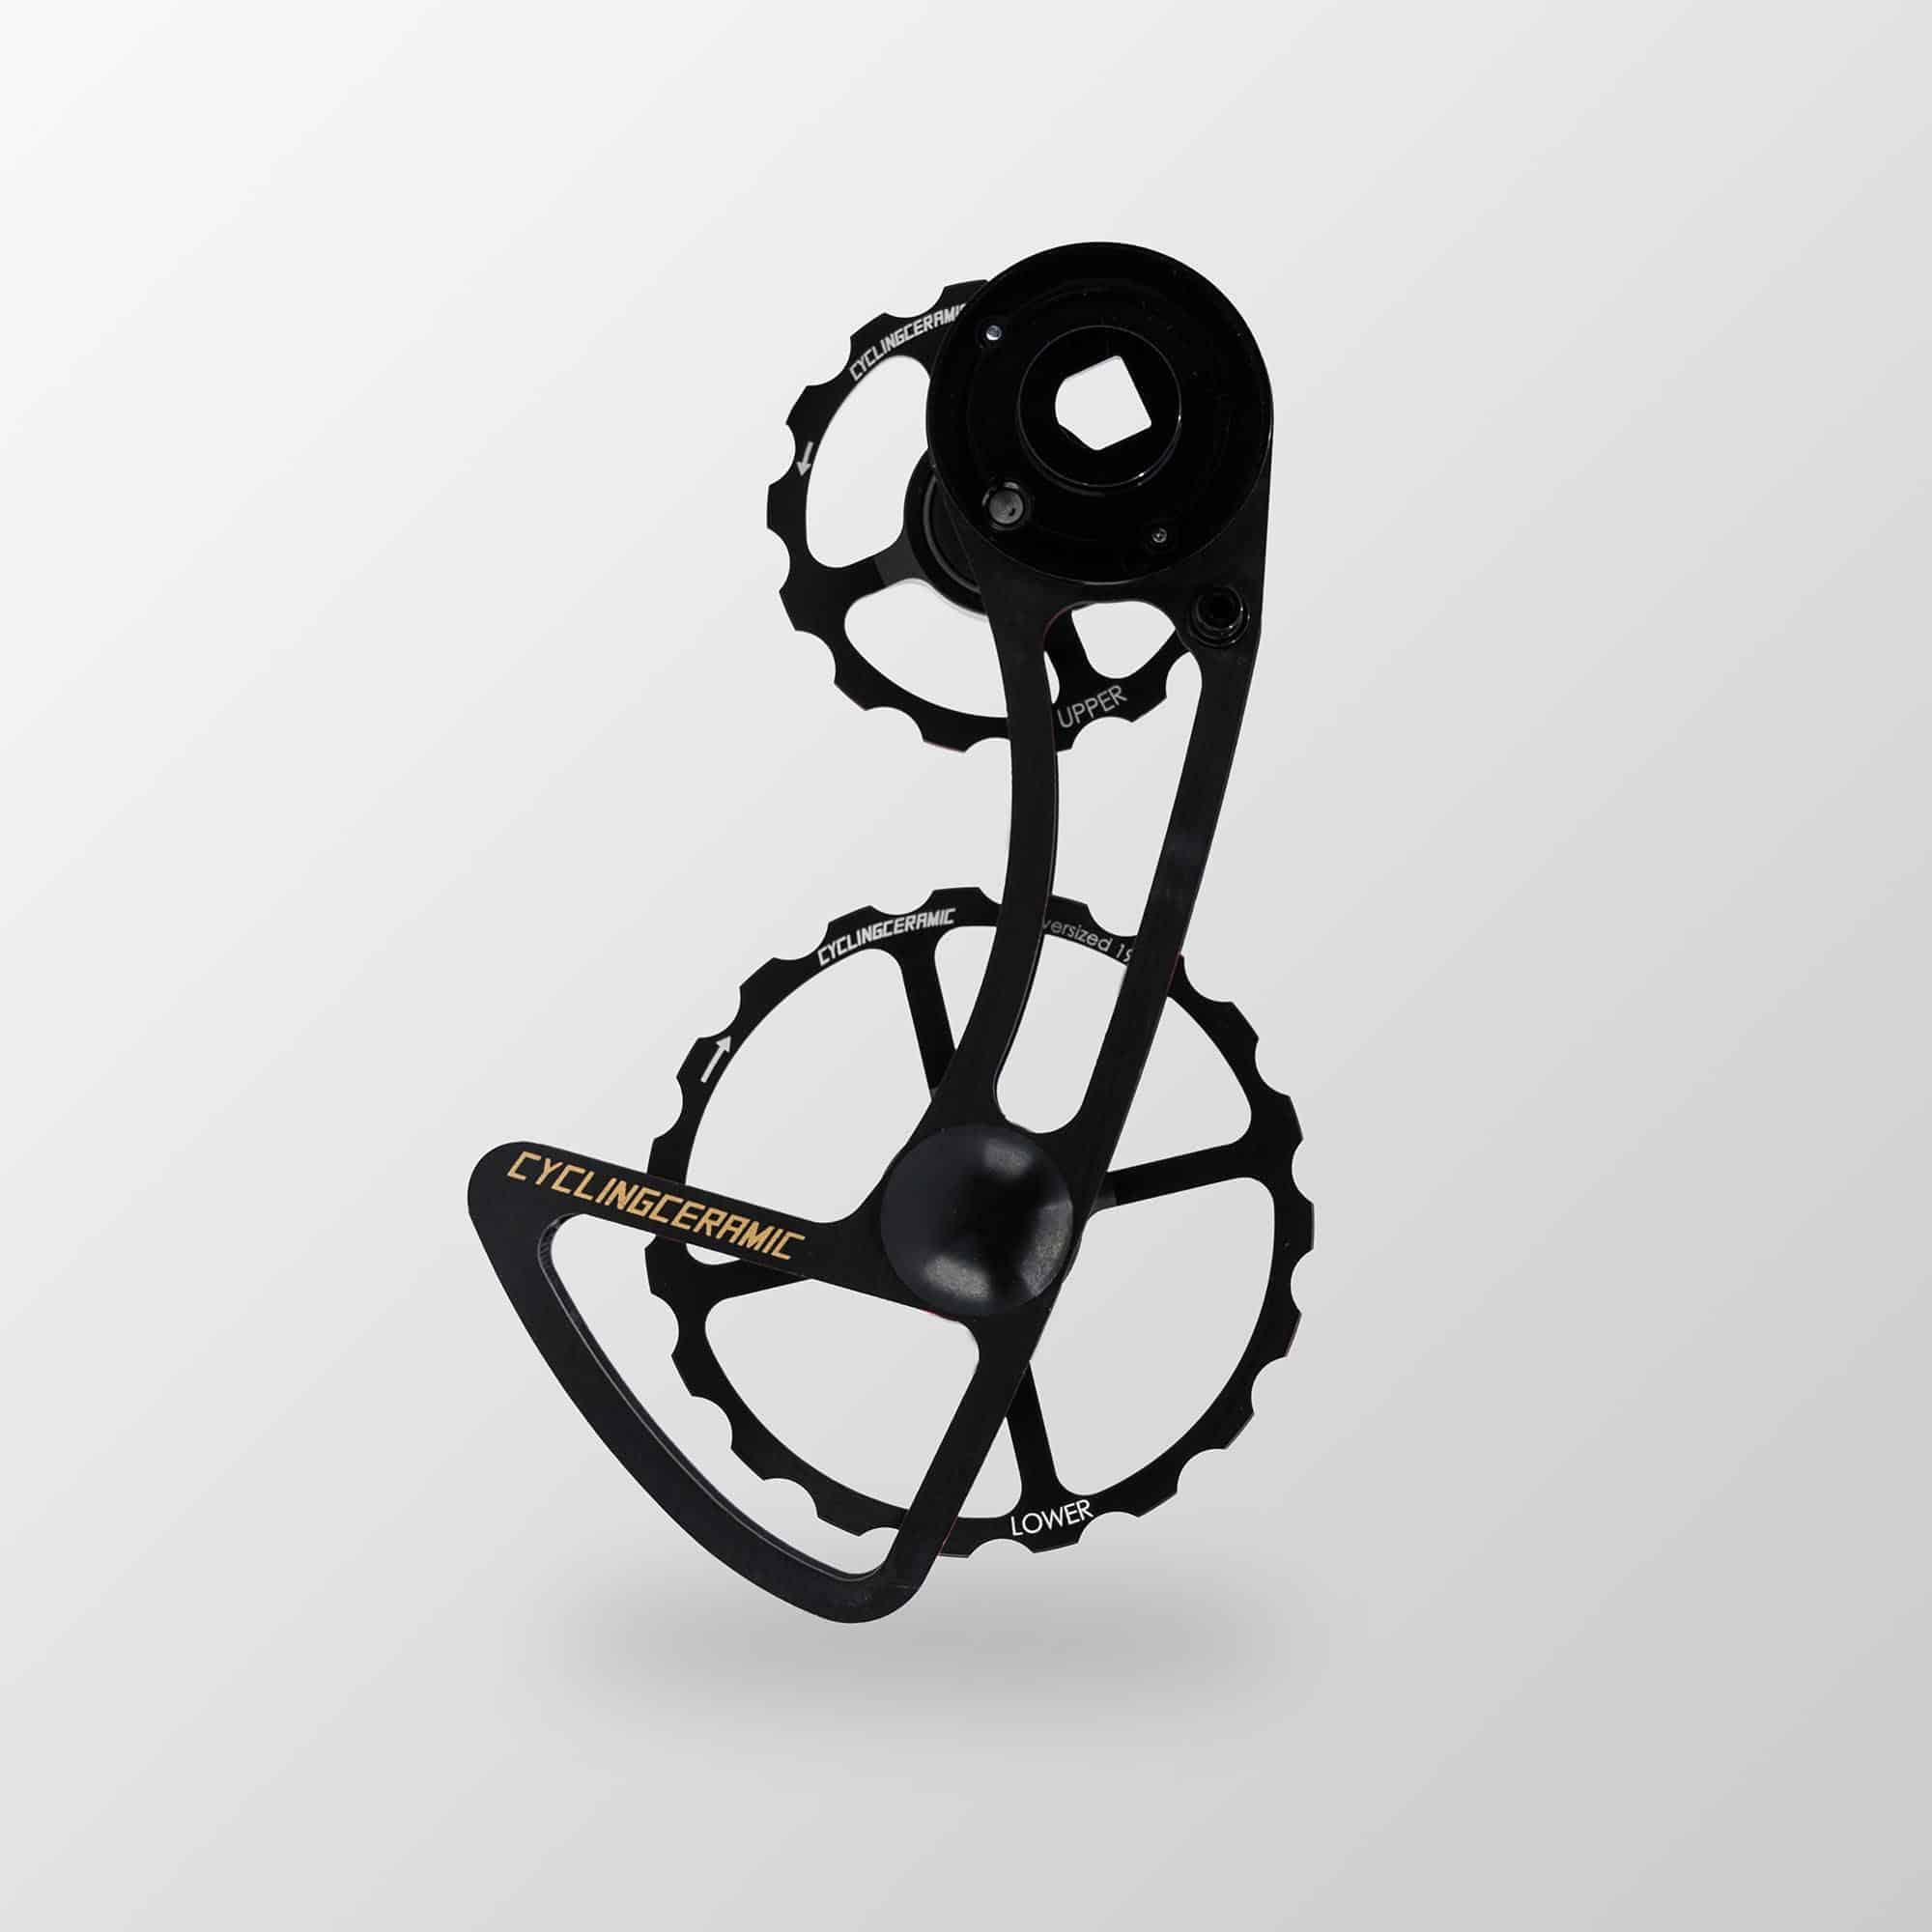 derailleur cage CyclingCeramic